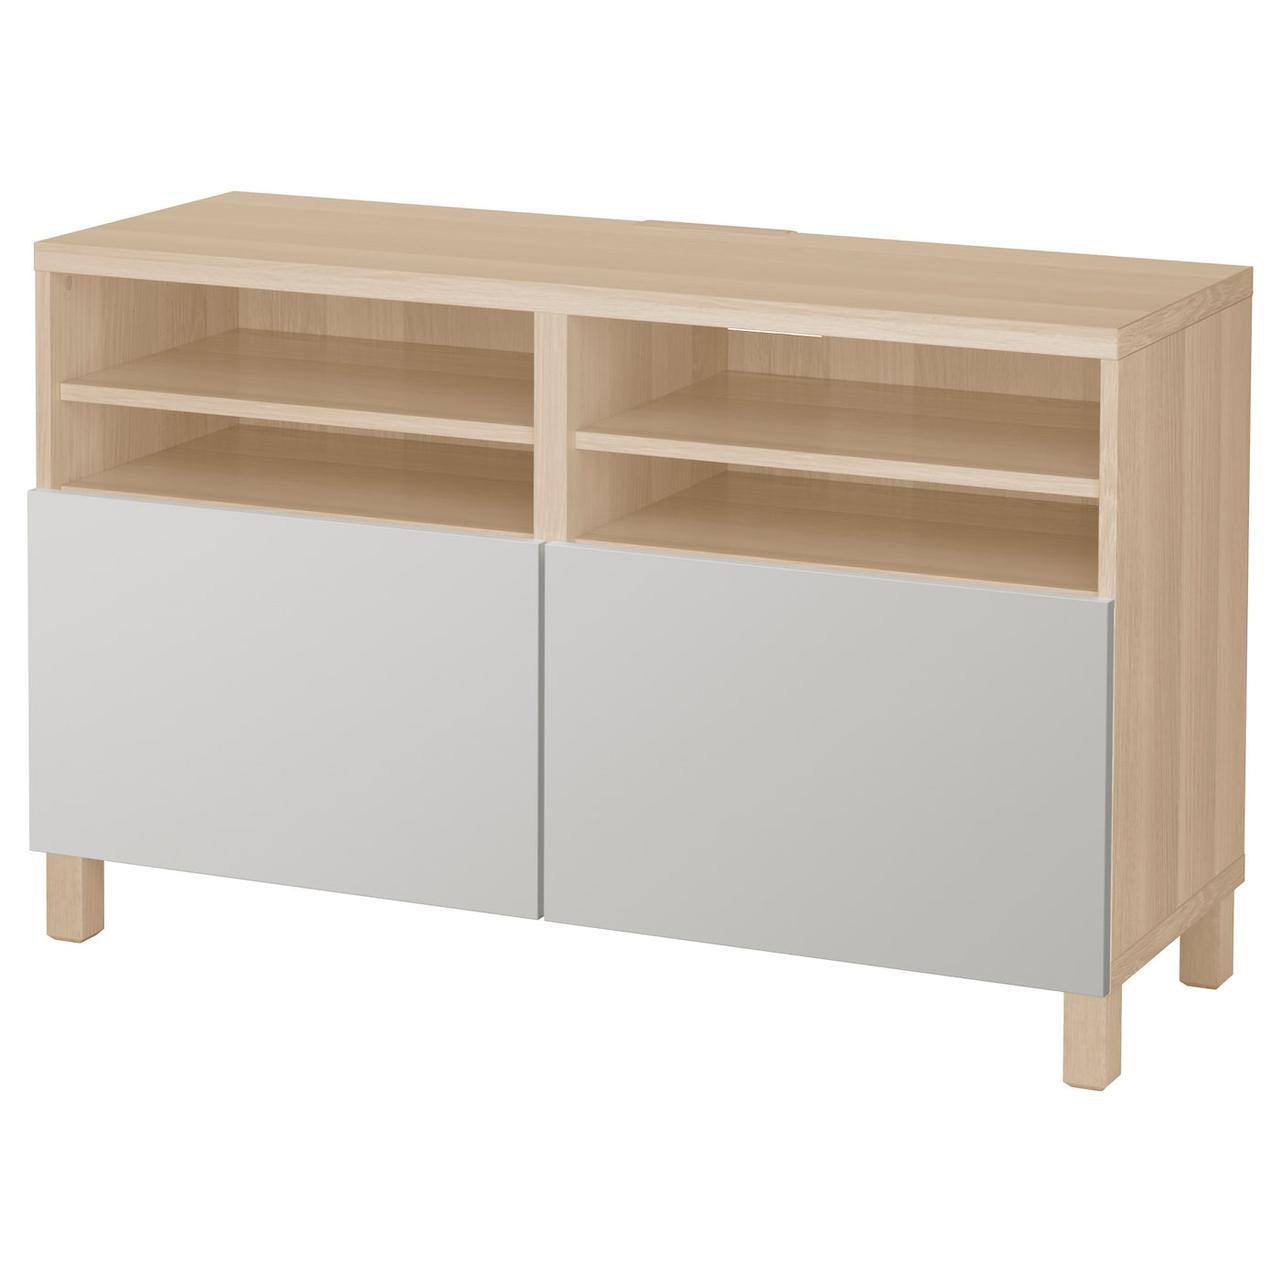 IKEA BESTÅ ТВ Шафа з дверцятами 120x42x74 см